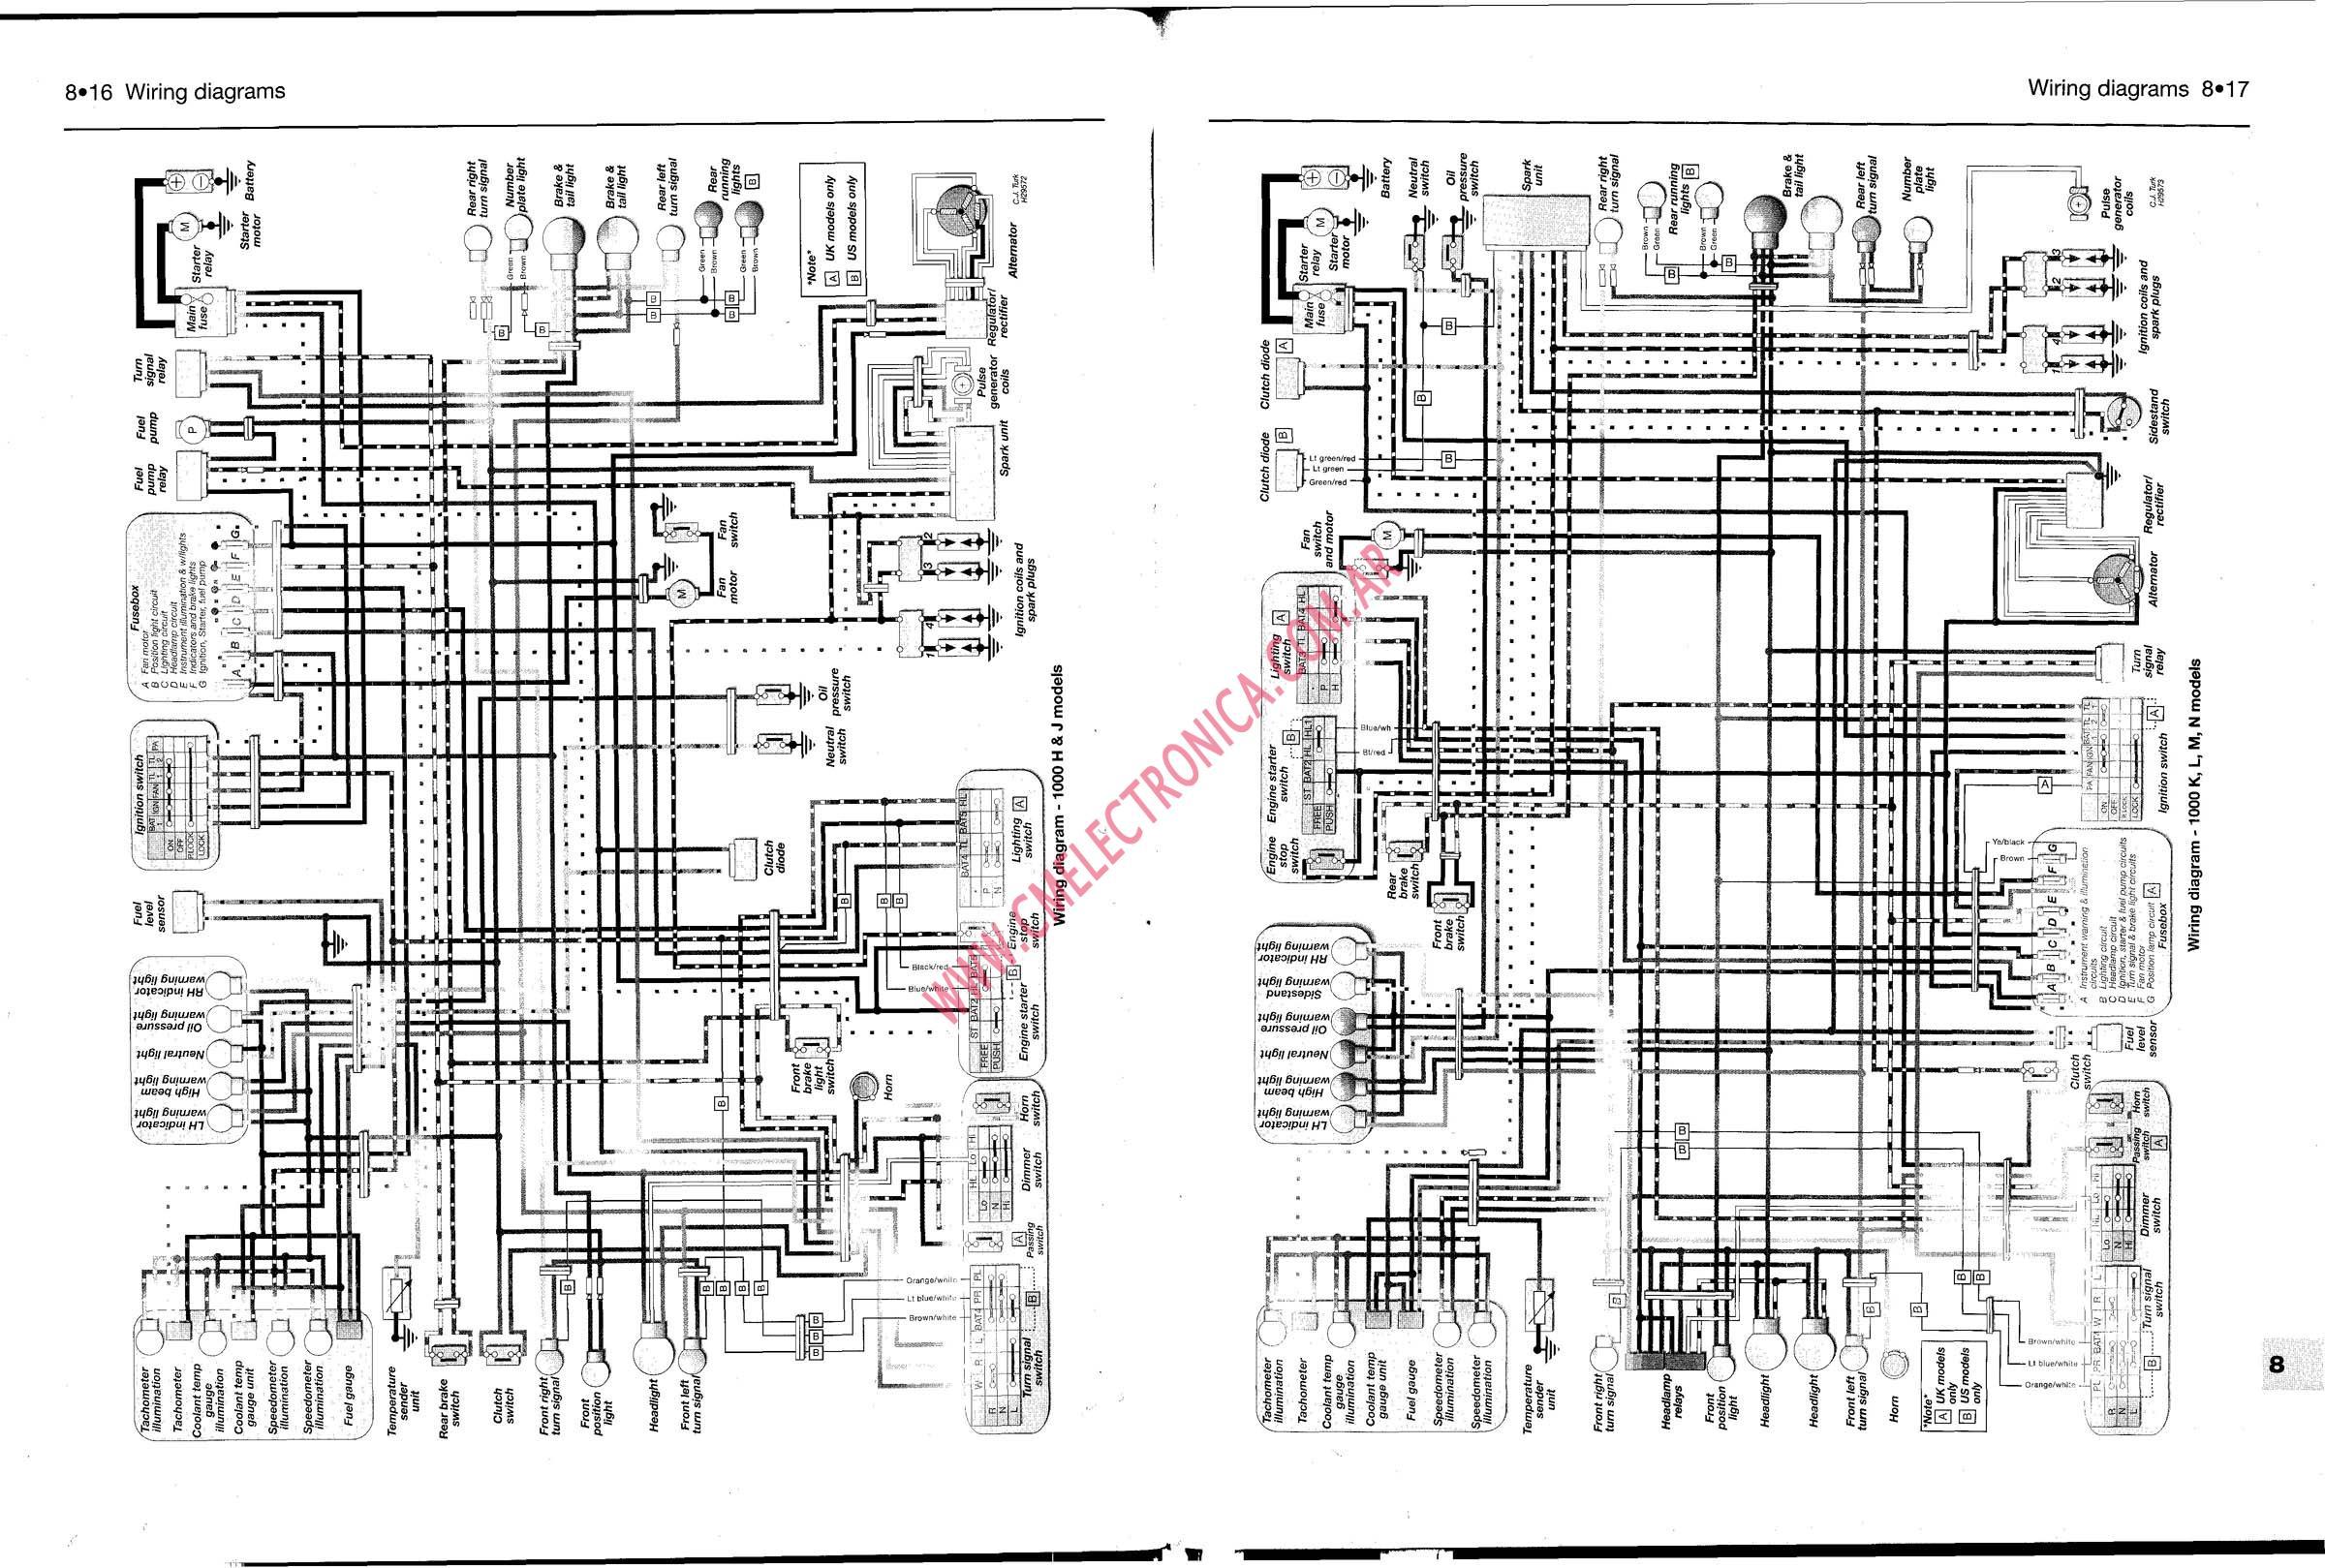 ZM_5529] 1991 Honda Cbr 1000 F Wiring Diagram Free DiagramJunap Aidew Illuminateatx Librar Wiring 101